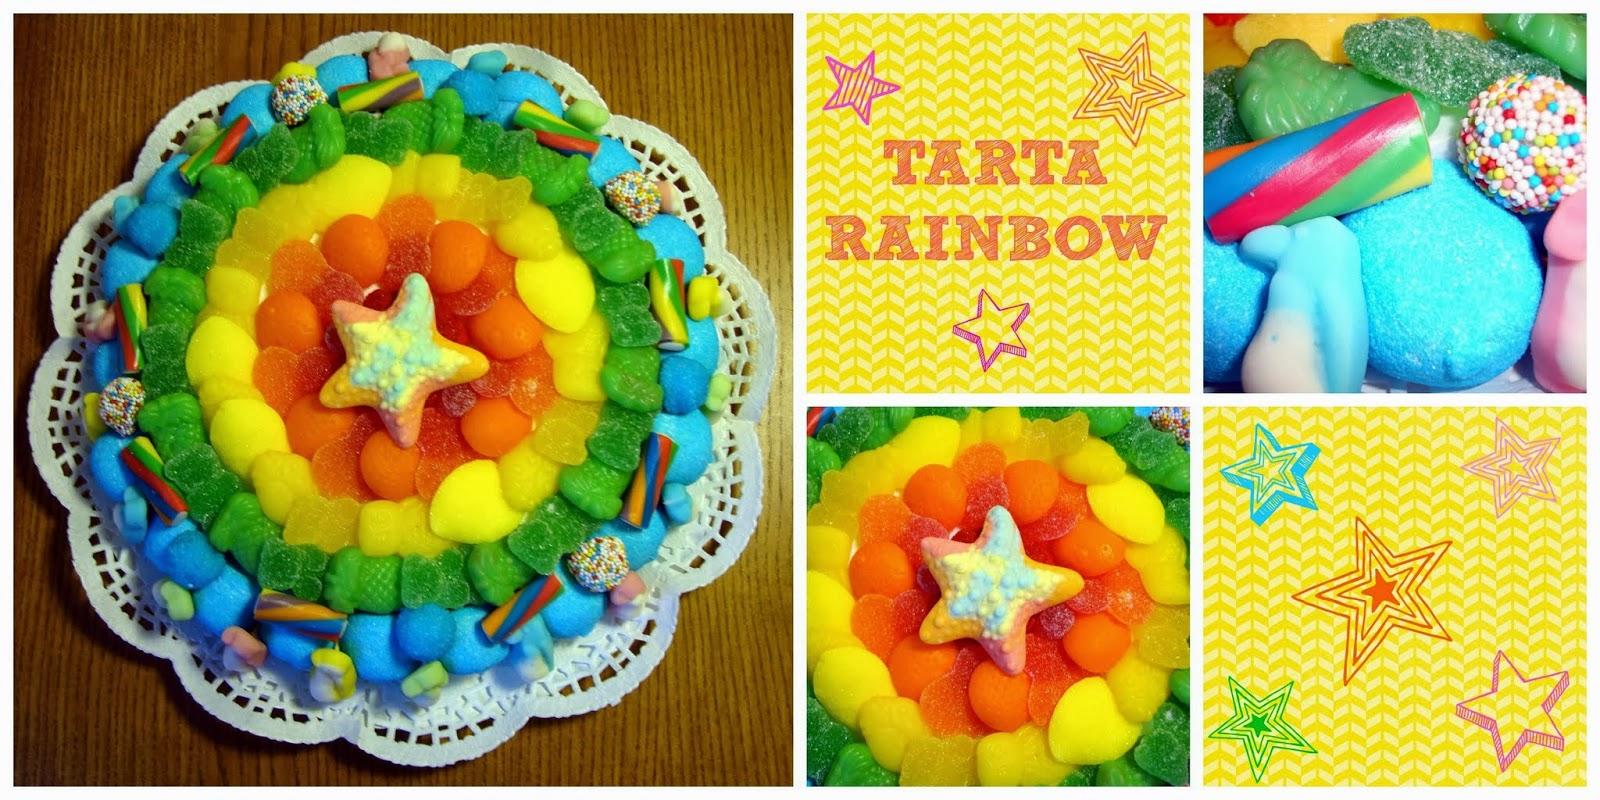 Z71+-+tarta+rainbow+peque%25C3%25B1a+1.jpg